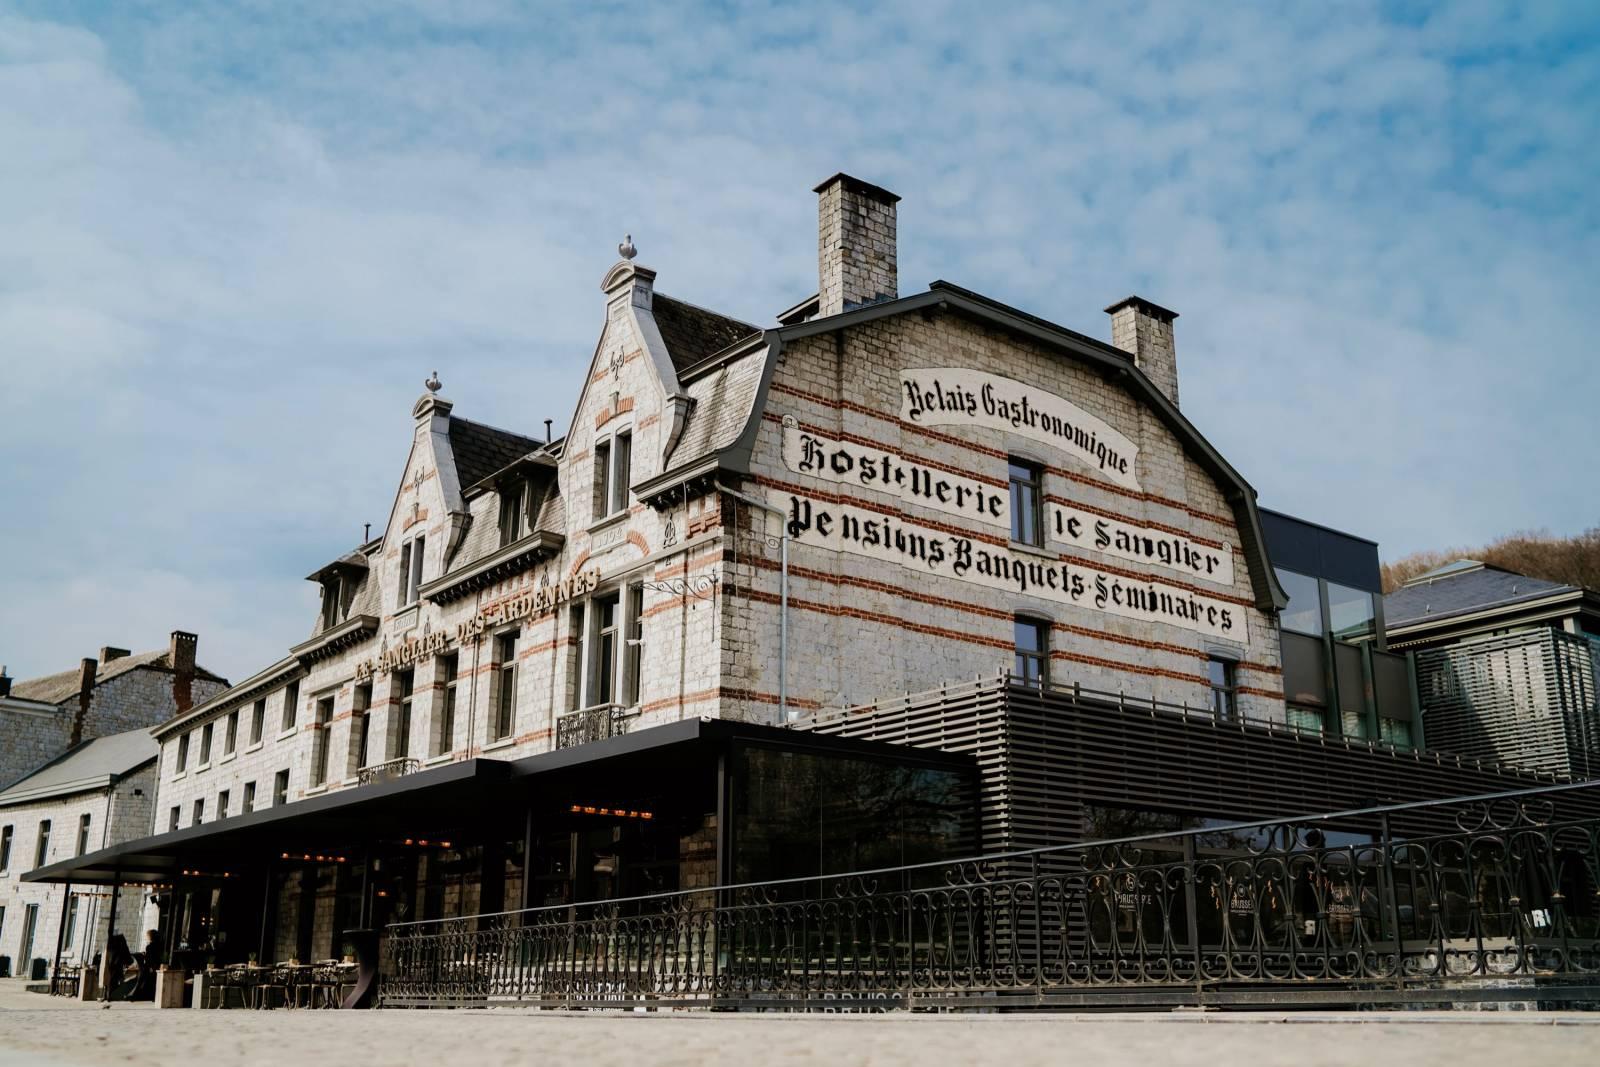 Le Sanglier des Ardennes, Durbuy - Feestzaal - Trouwzaal - House of Weddings - 9